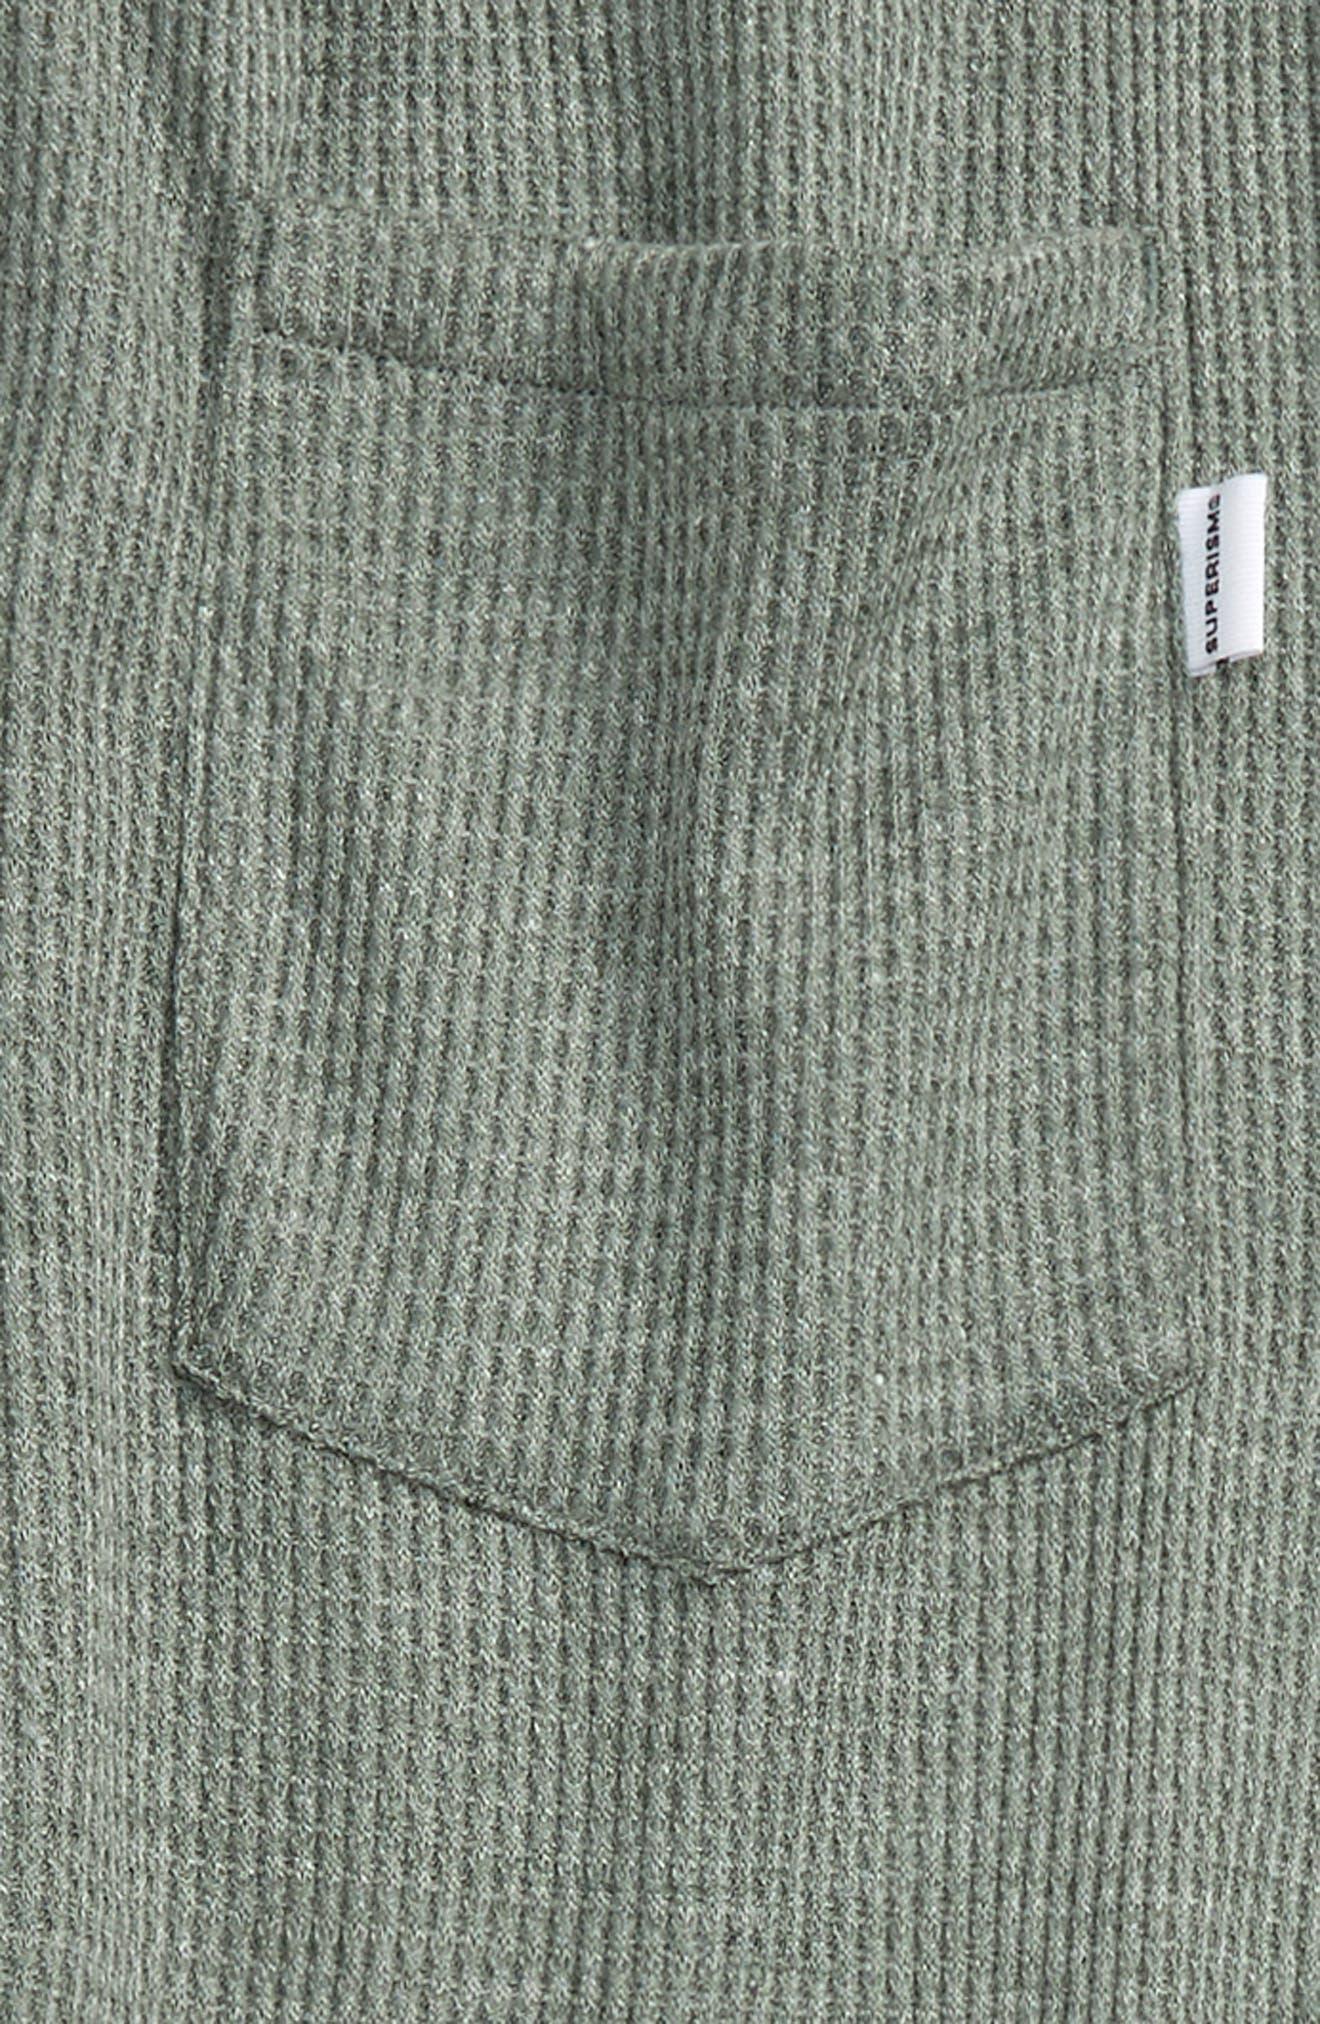 Alternate Image 3  - Superism Jude Thermal Knit Jogger Pants (Big Boys)